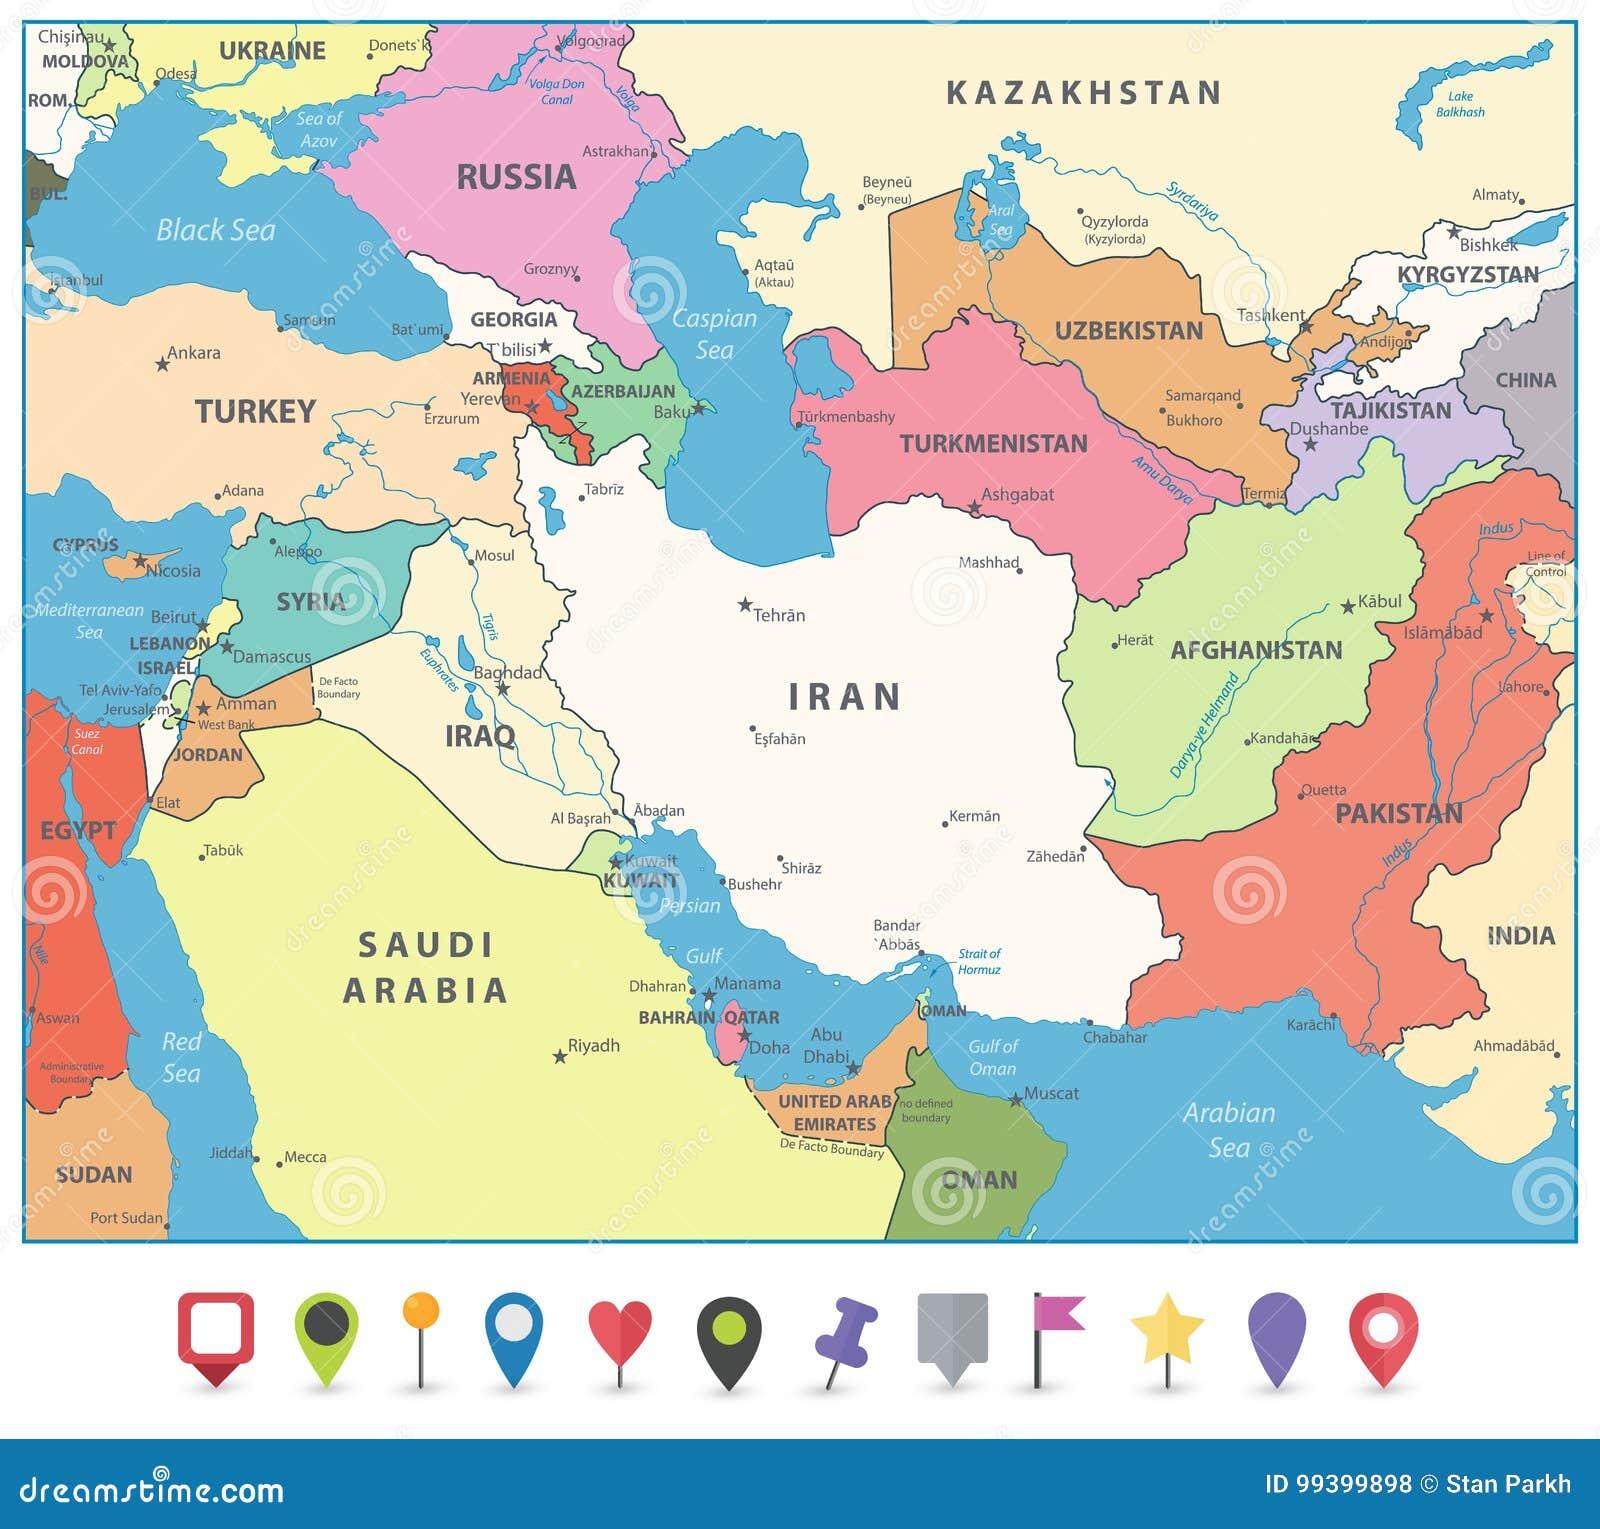 East Asia Meets The Southwest: Карта Передней Азии и плоские отметки карты Иллюстрация